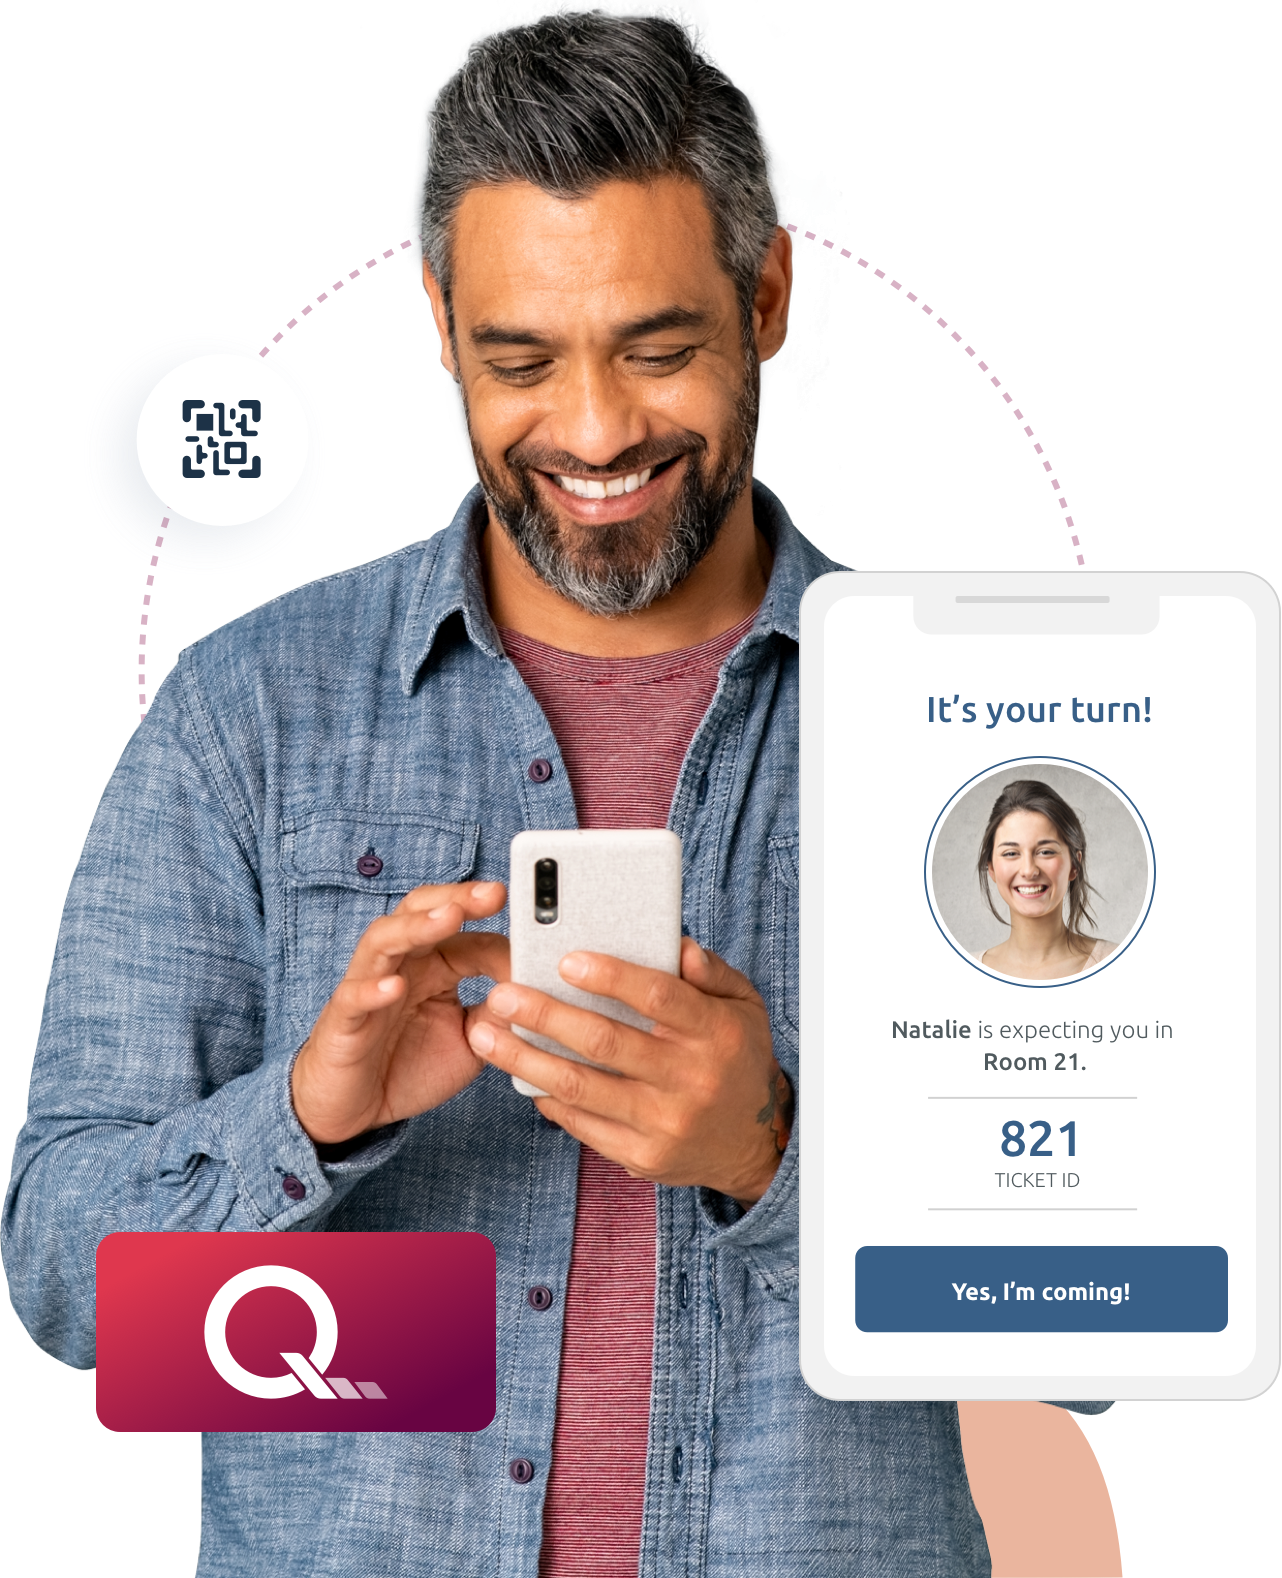 Virtual queue management solution